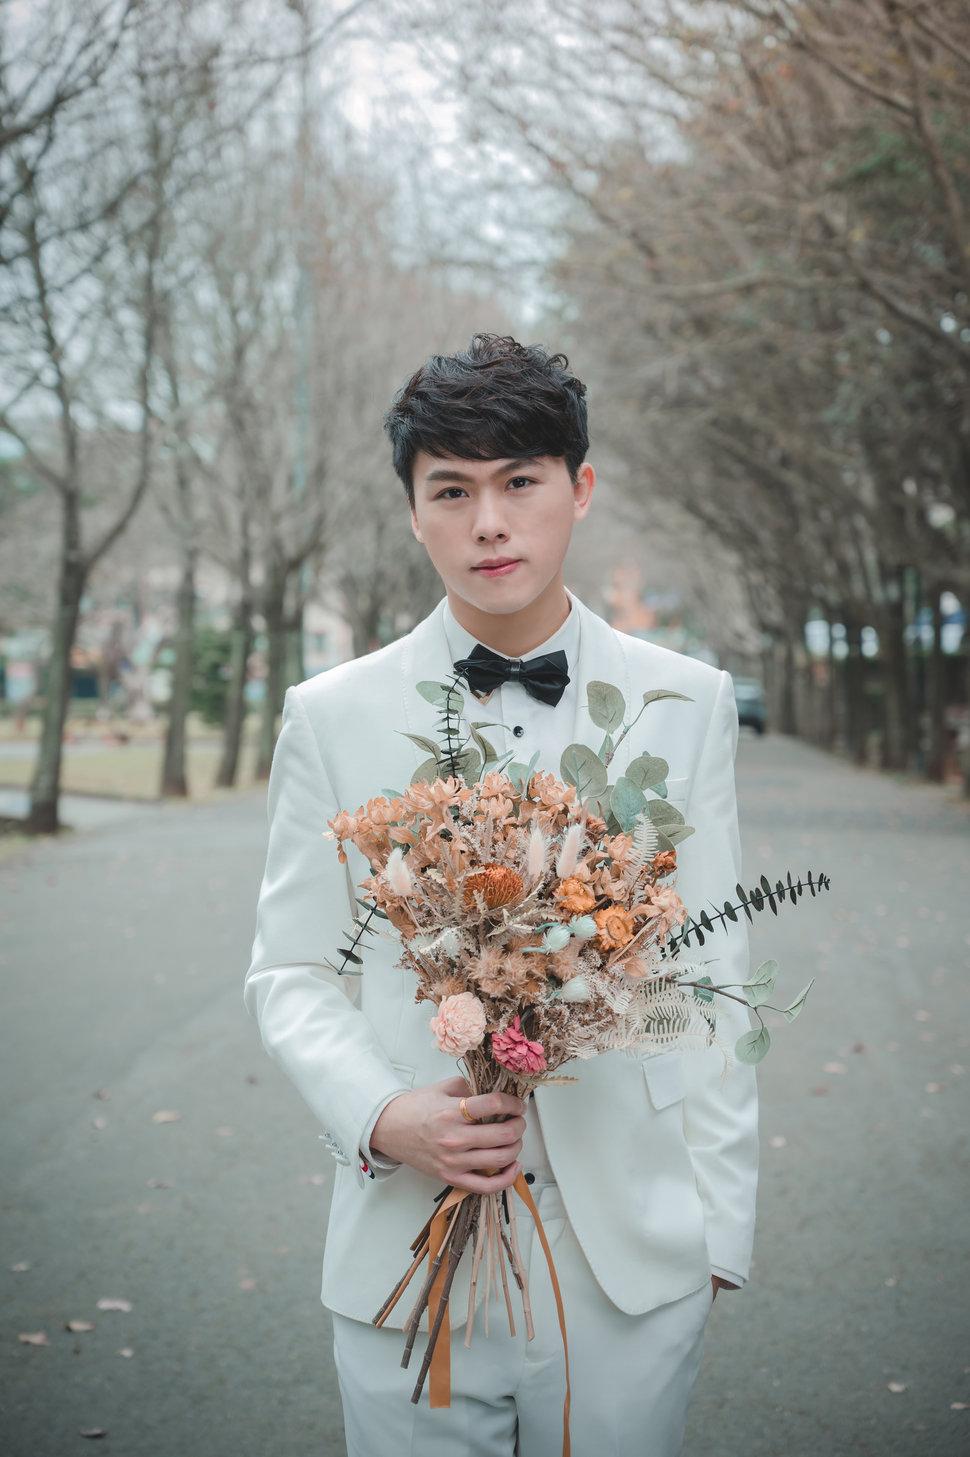 20200111-YEU_5517-1 - 花蓮婚紗 - Sposa Bella《結婚吧》